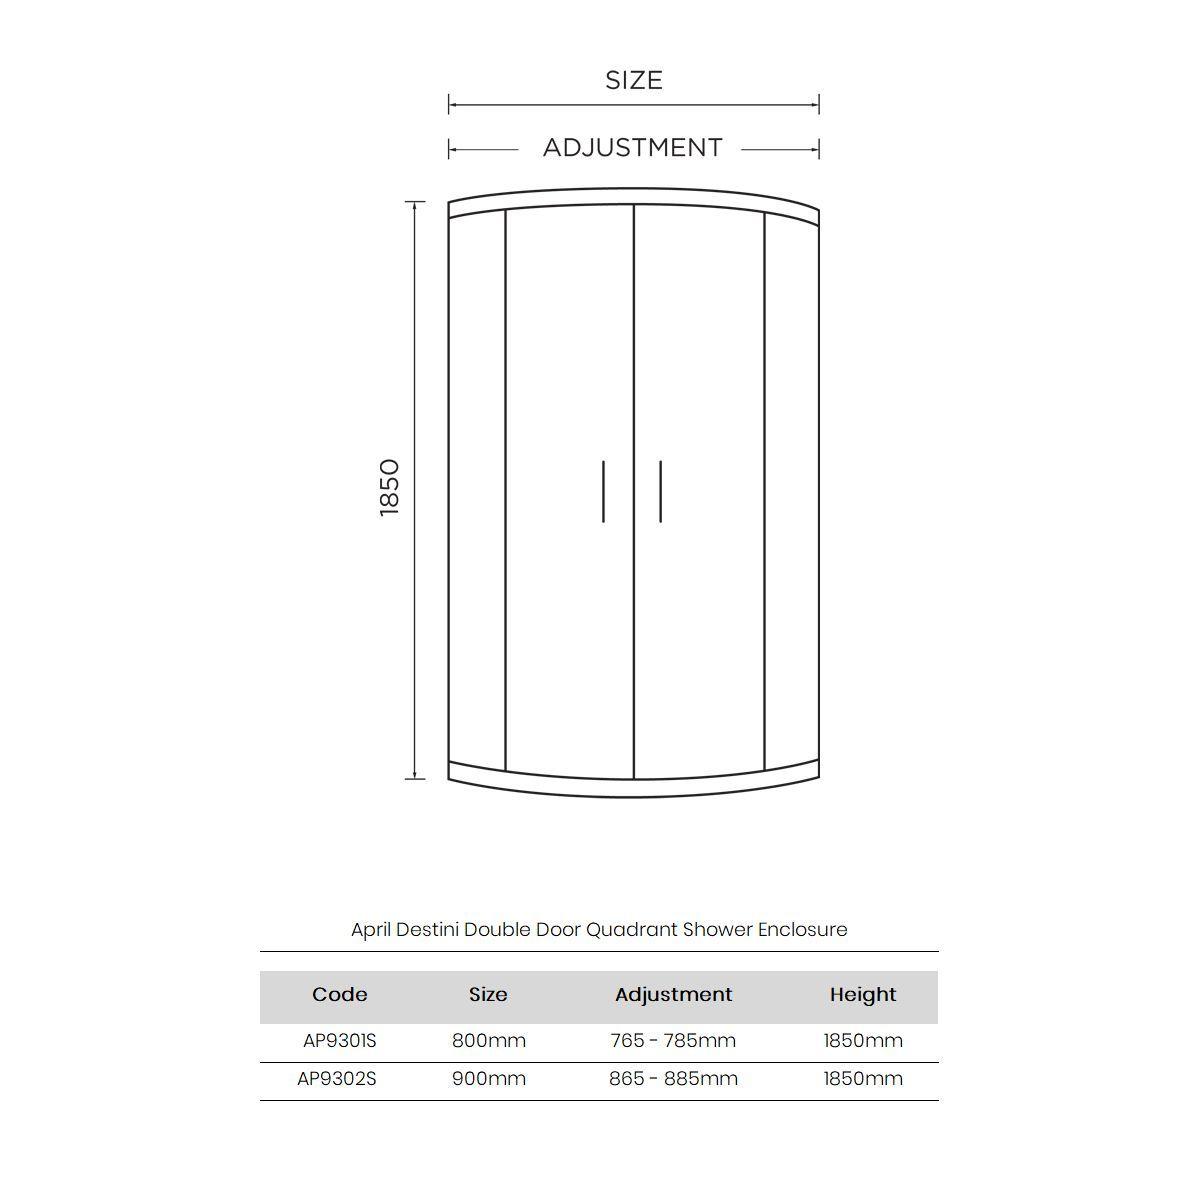 April Destini Double Door Quadrant Shower Enclosure Dimensions